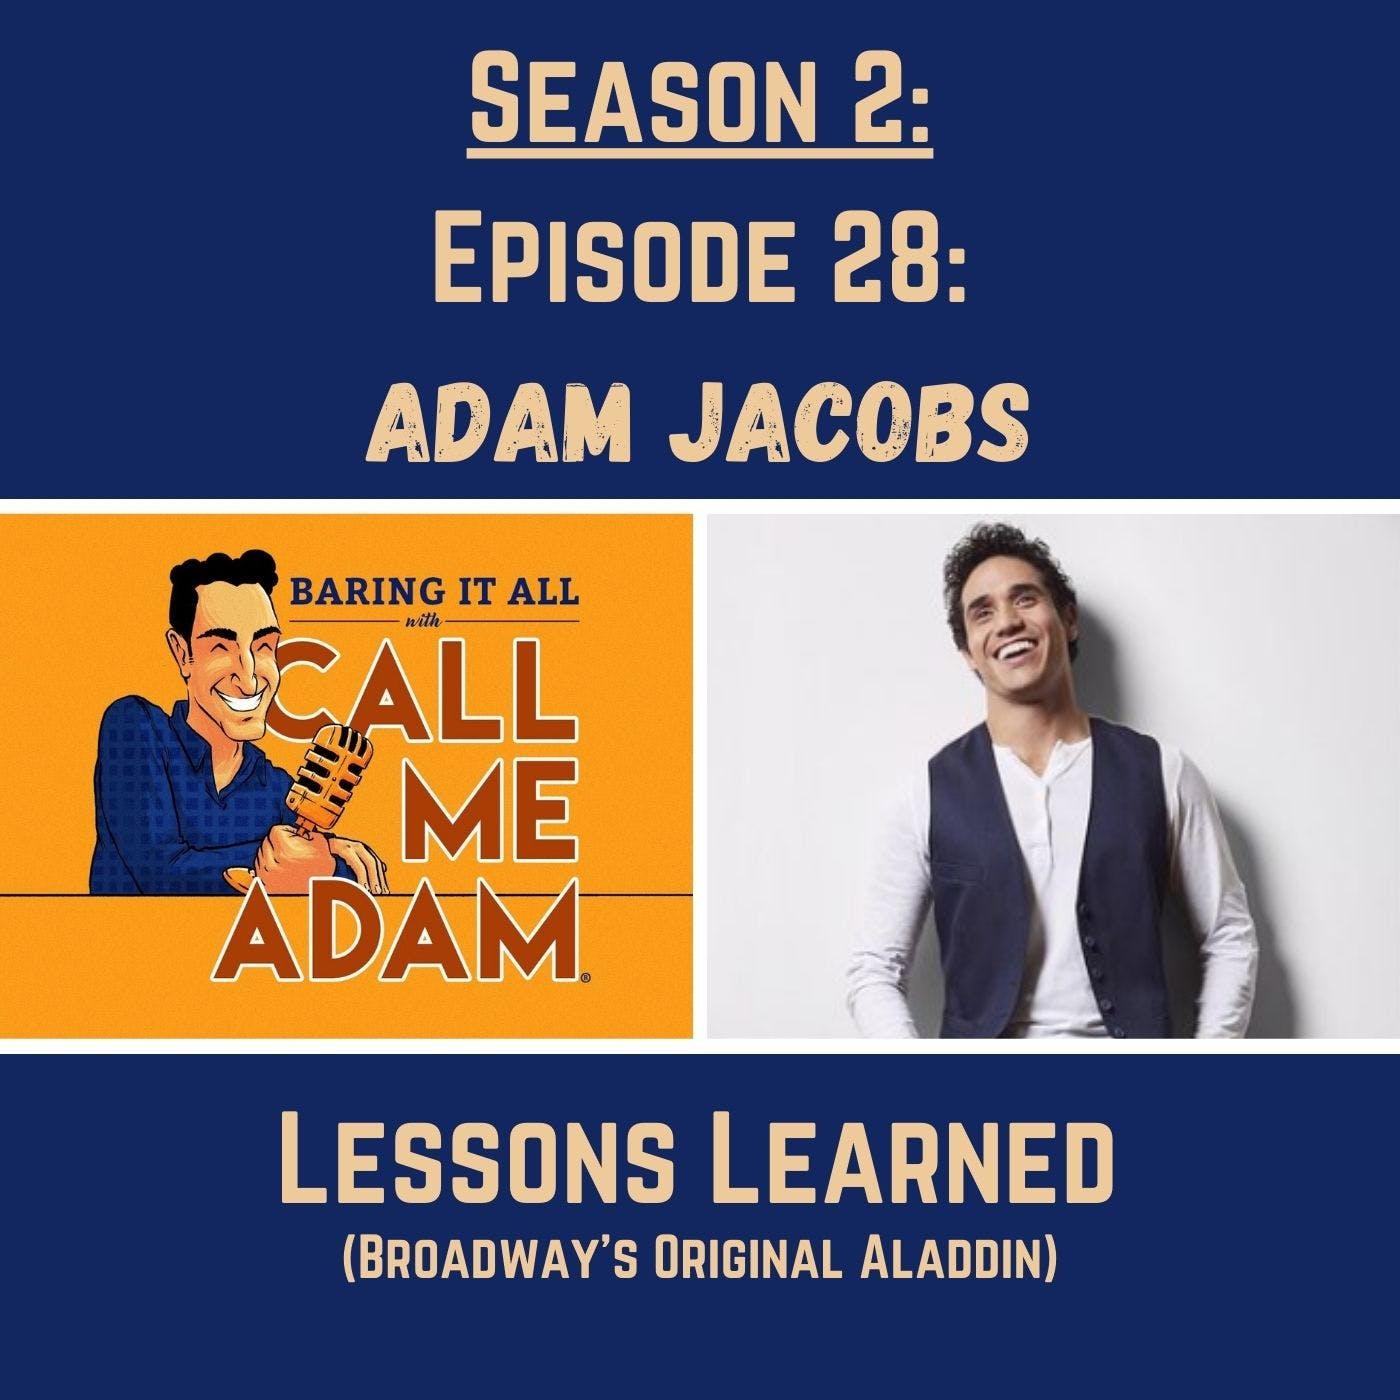 Season 2: Episode 28: Adam Jacobs Returns: Aladdin, Broadway, Lessons Learned, Stolen Cars, Arielle Jacobs, Actor, Singer, Family, Fatherhood